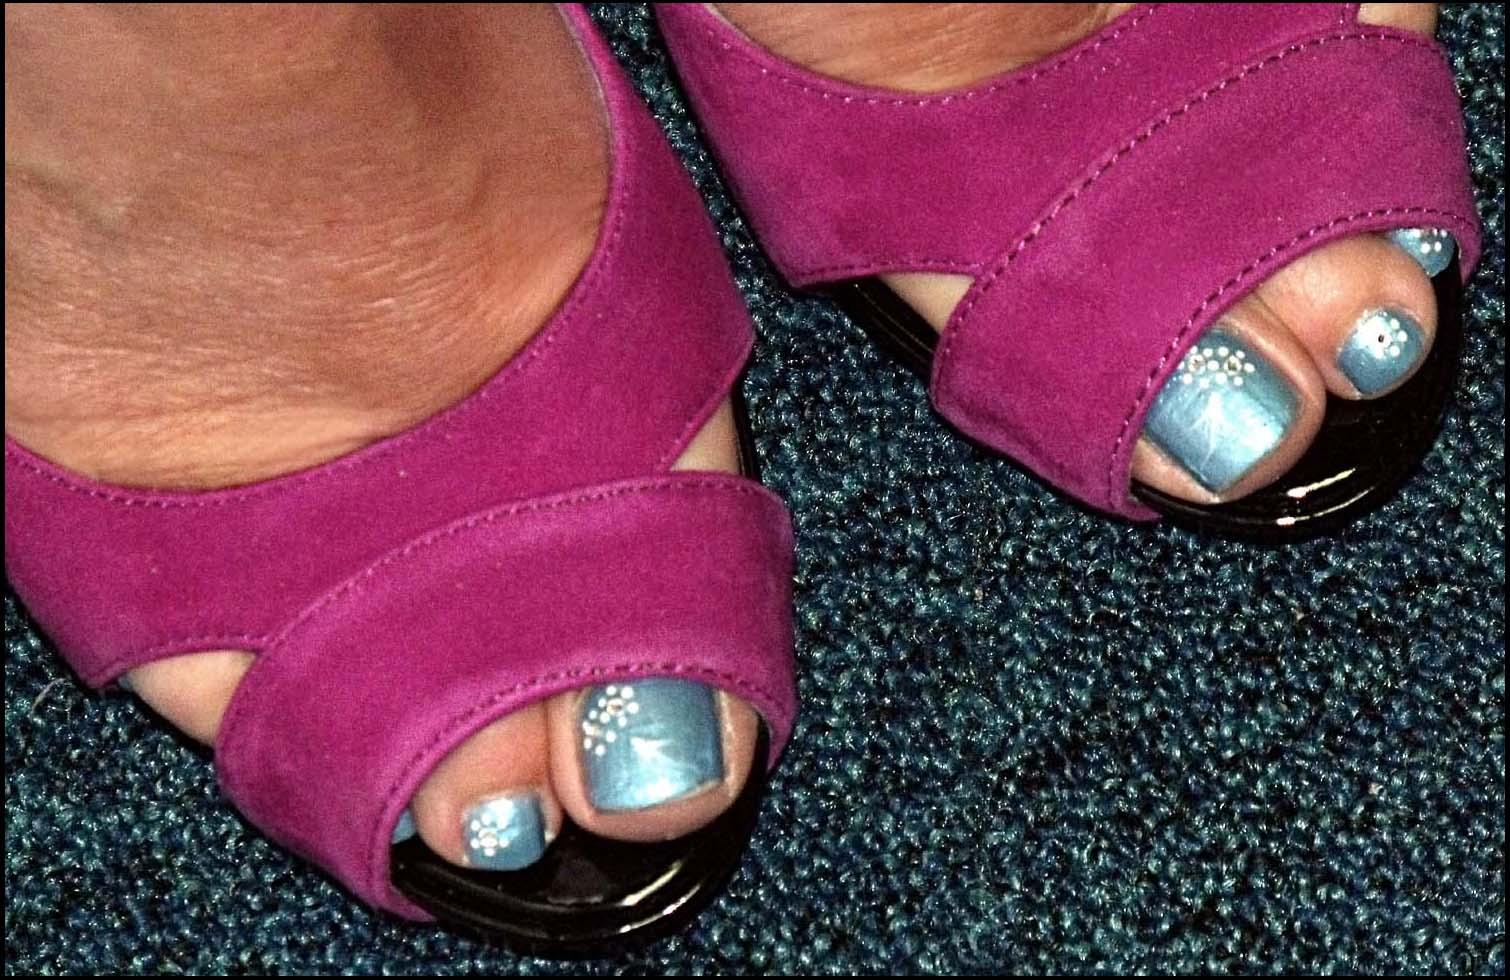 Purple,shoes,blue,nails,foot,footwear,leg,buckle,painted,toe,toes,toenail,toenails,365days,west,midlands,england,uk,britain,GB,europe,english,angela,feet,hotpix!